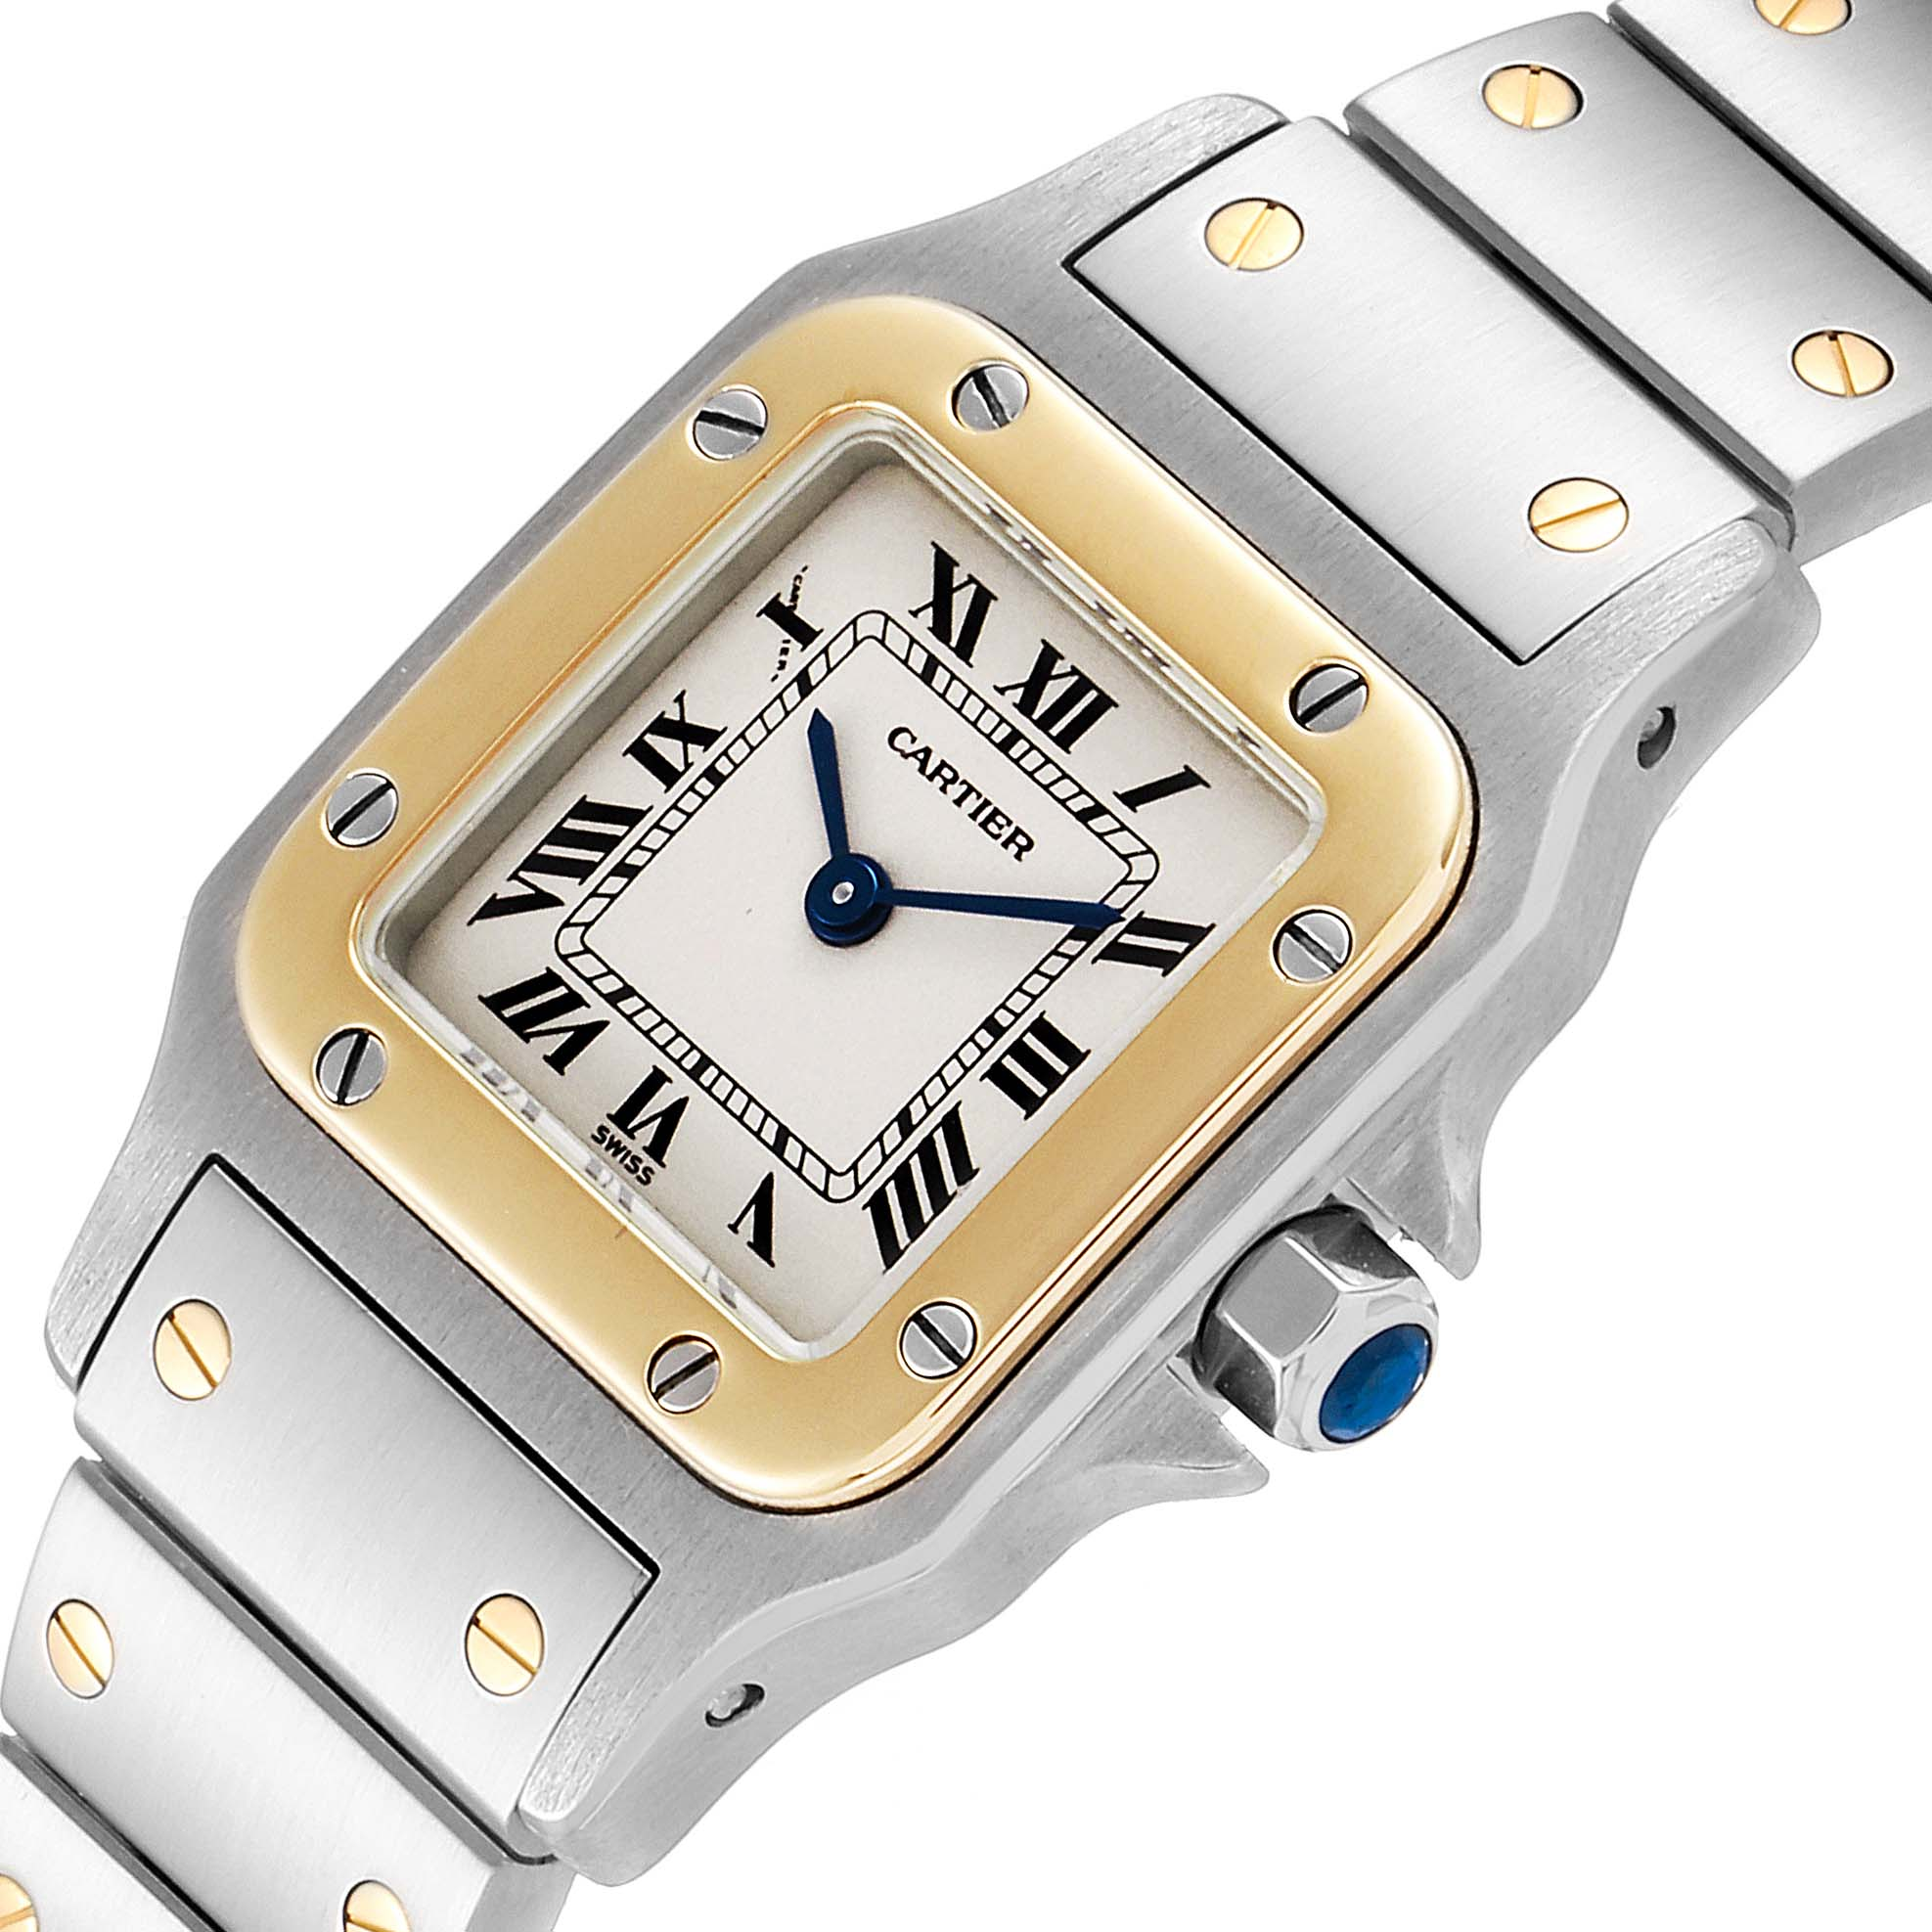 Cartier Santos Galbee Steel Yellow Gold Ladies Watch W20012C4 Box Papers SwissWatchExpo